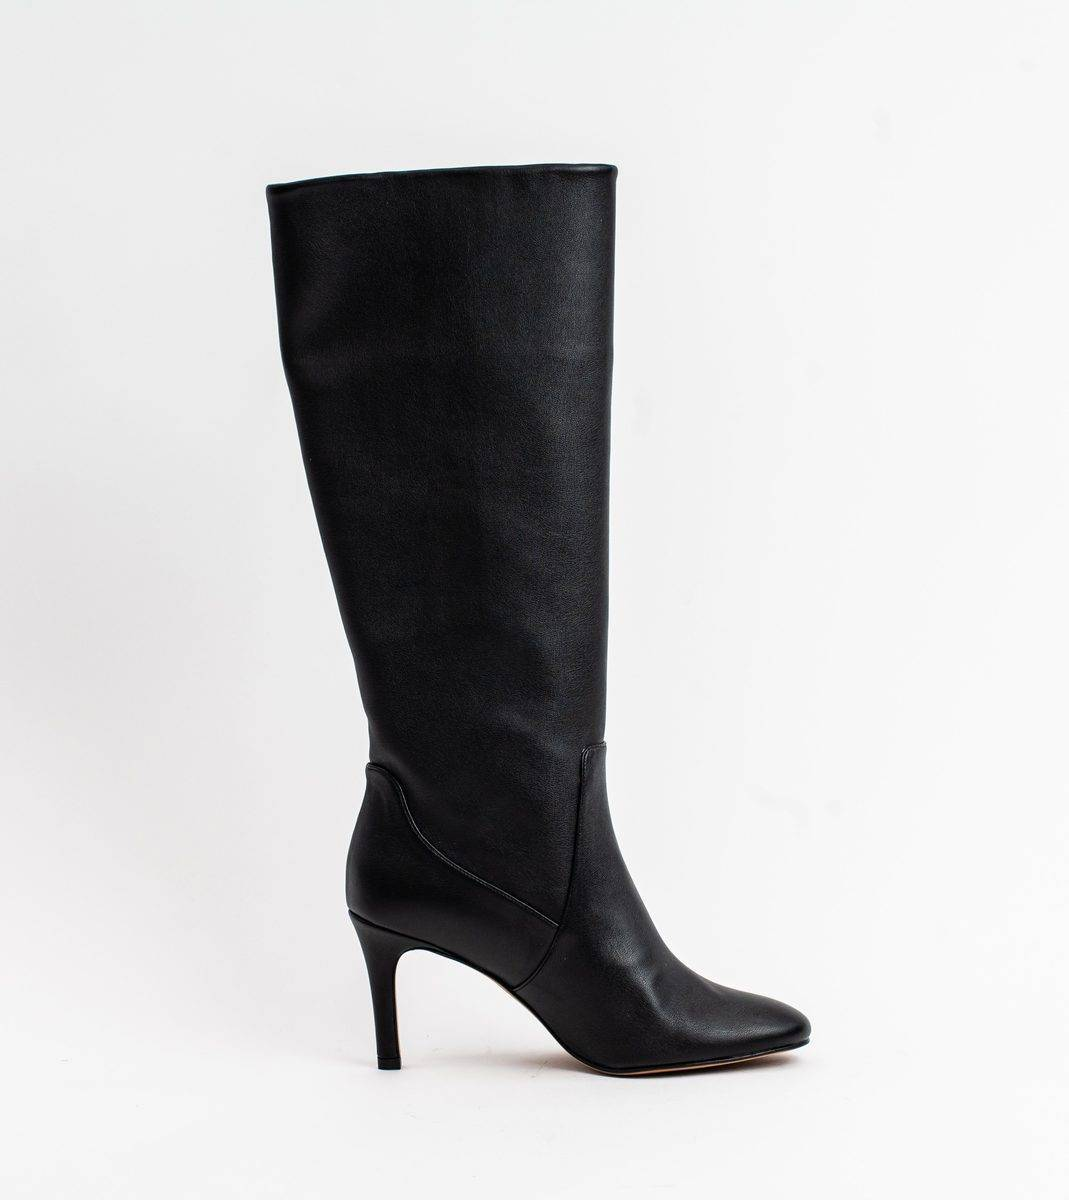 Chloe Black Vegan Leather Heeled Long Boot